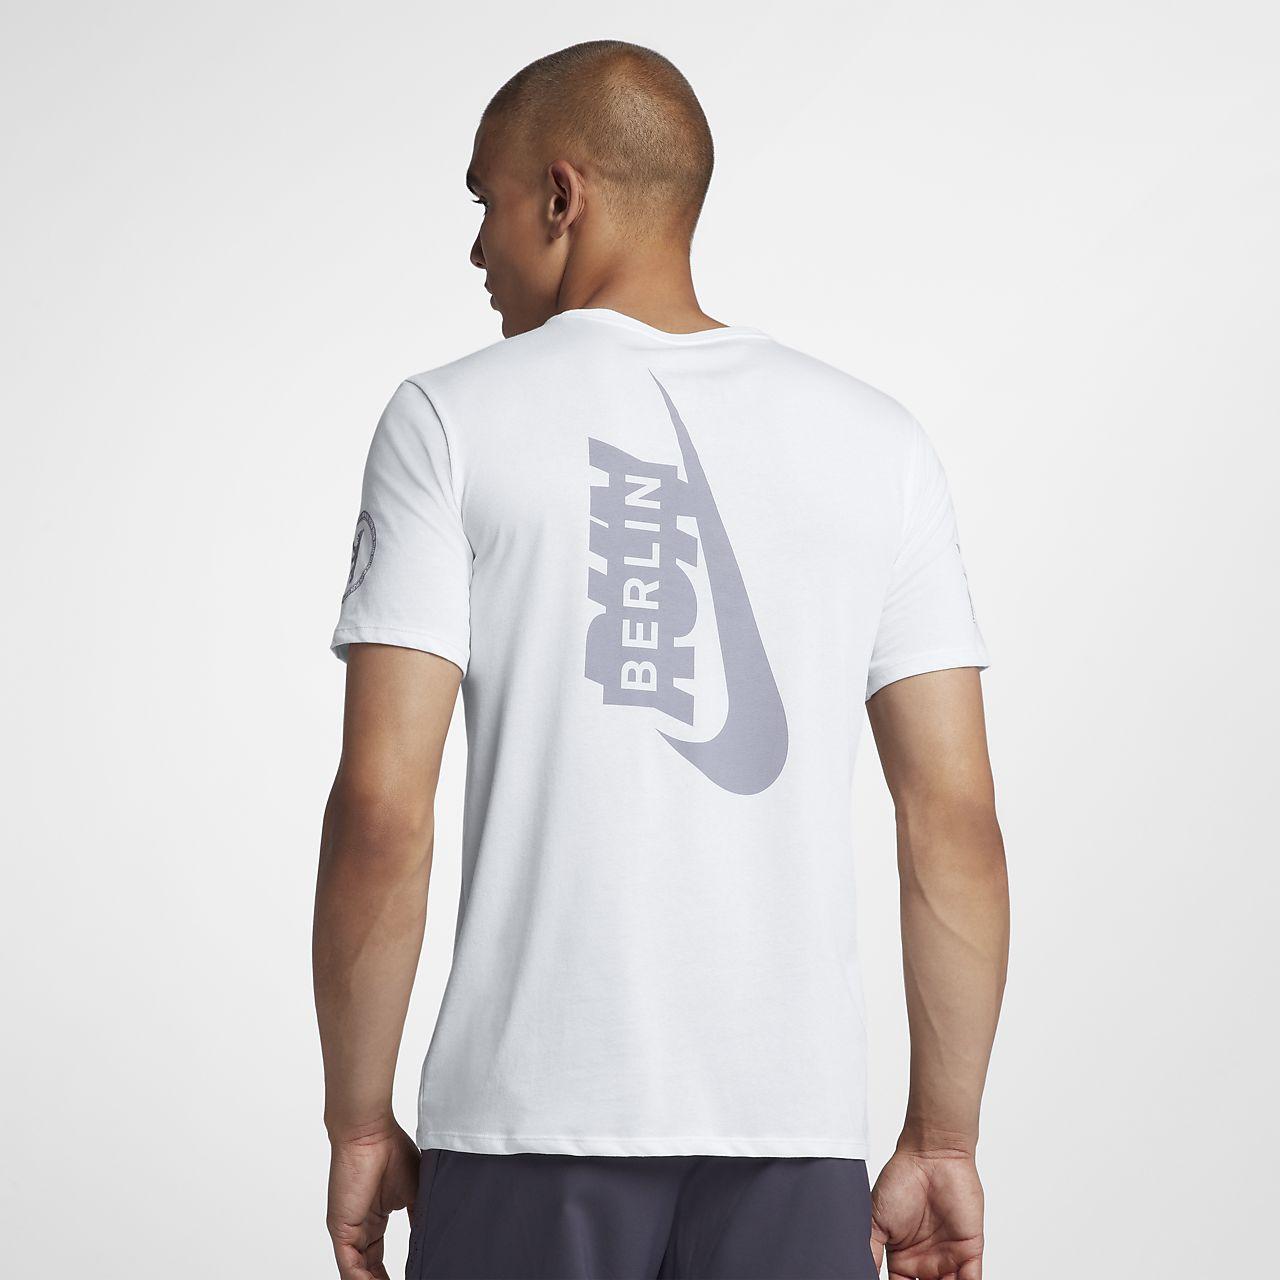 637e0172a8 Playera de running para hombre Nike Dri-FIT (Berlin 2018). Nike.com MX